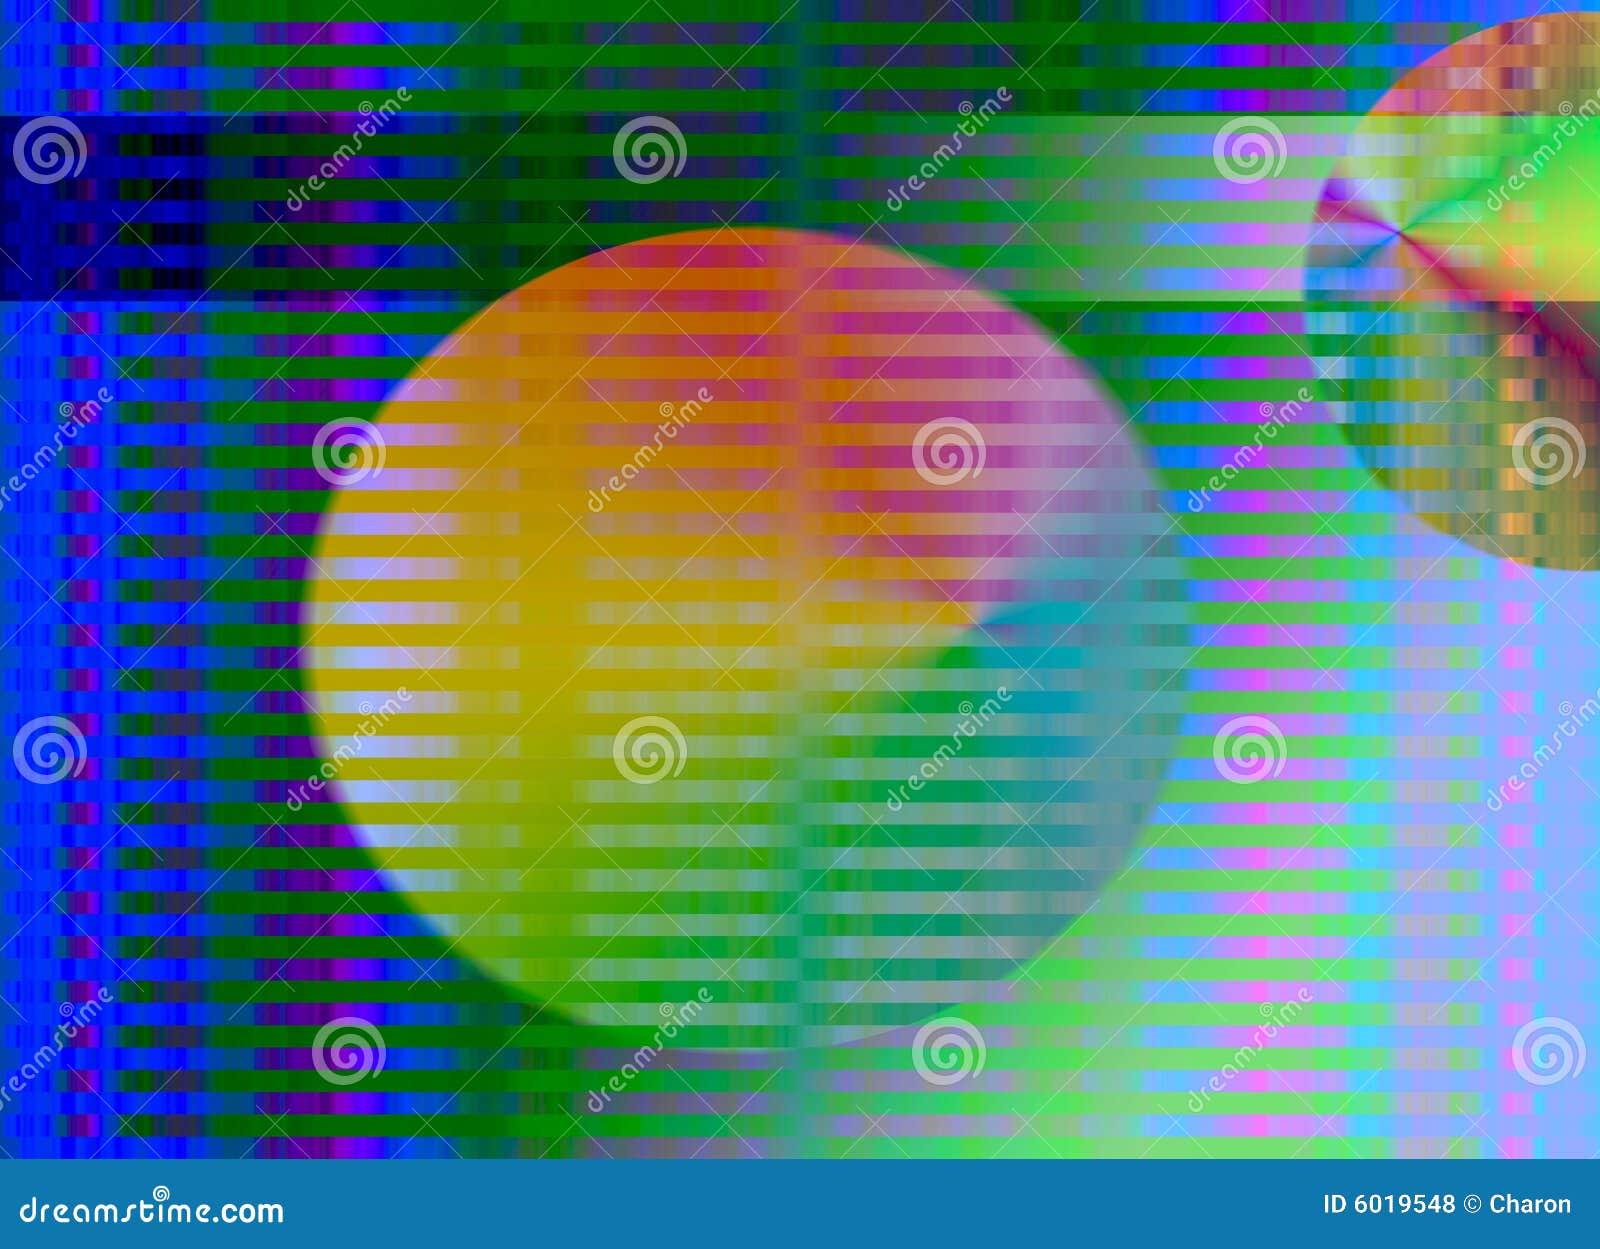 Fondo colorido abstracto del modelo